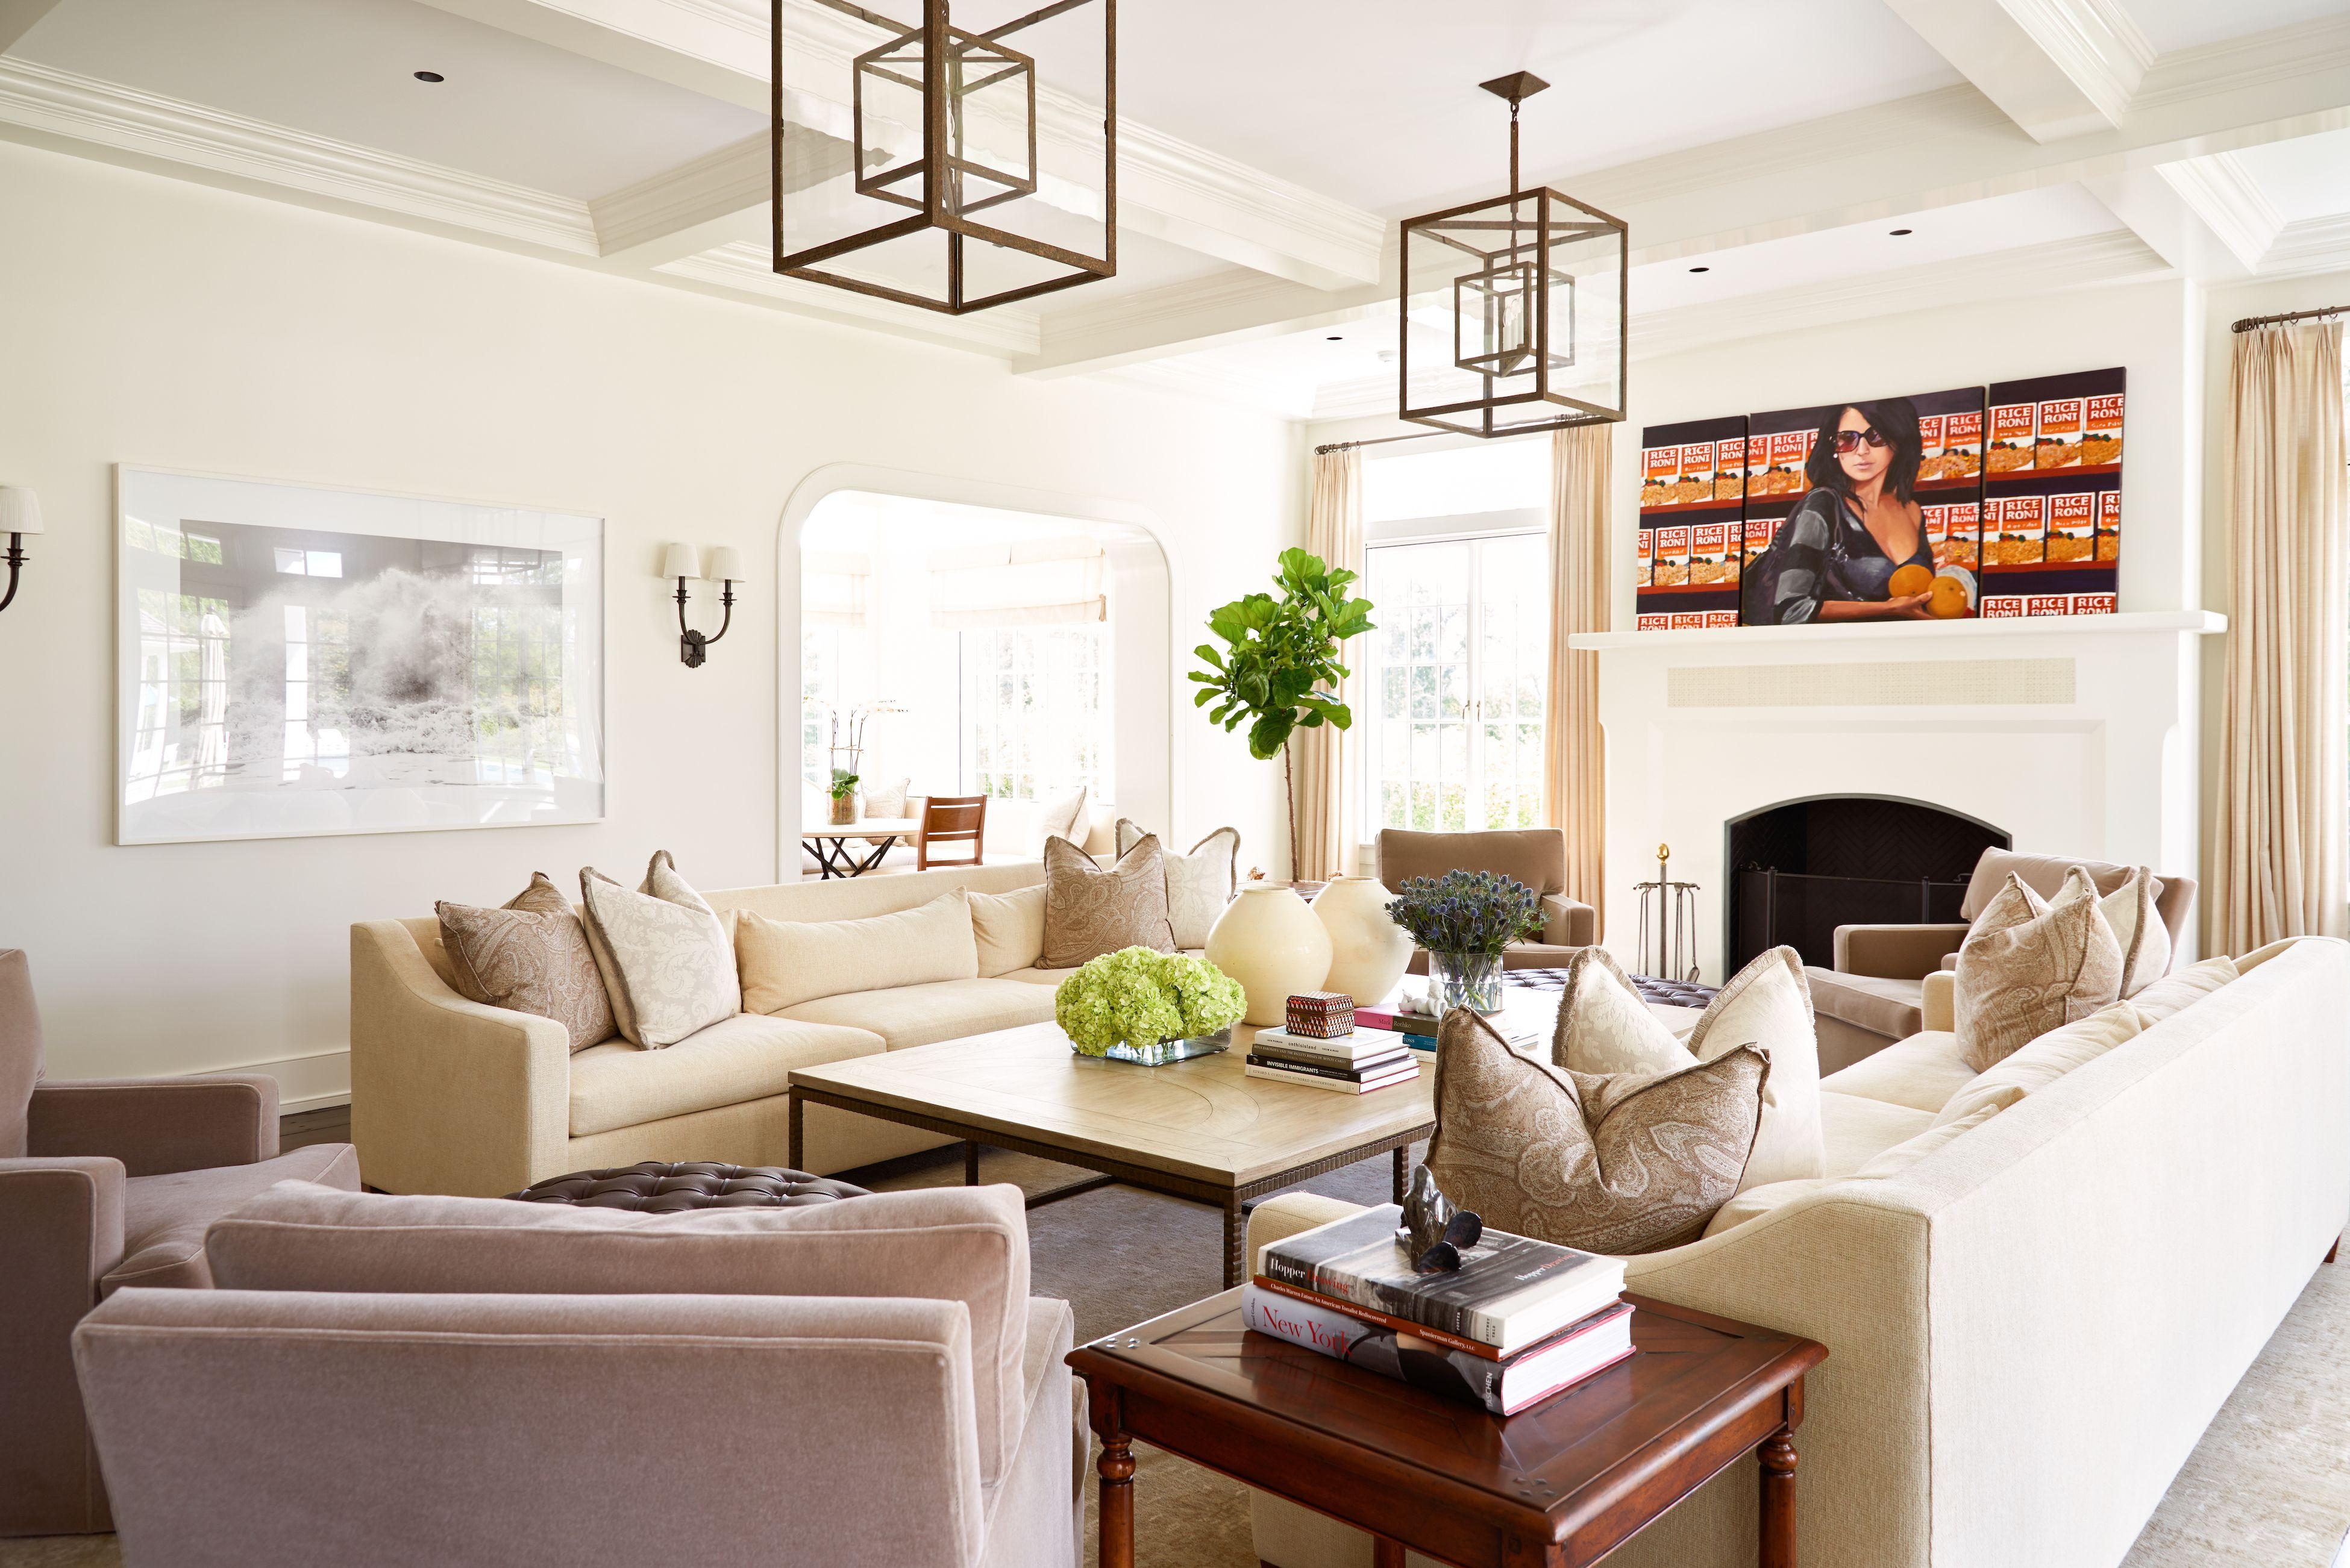 Tour Alec Baldwin And Hilaria Baldwinu0027s House In The Hamptons   East Hampton  Celebrity Homes Part 77